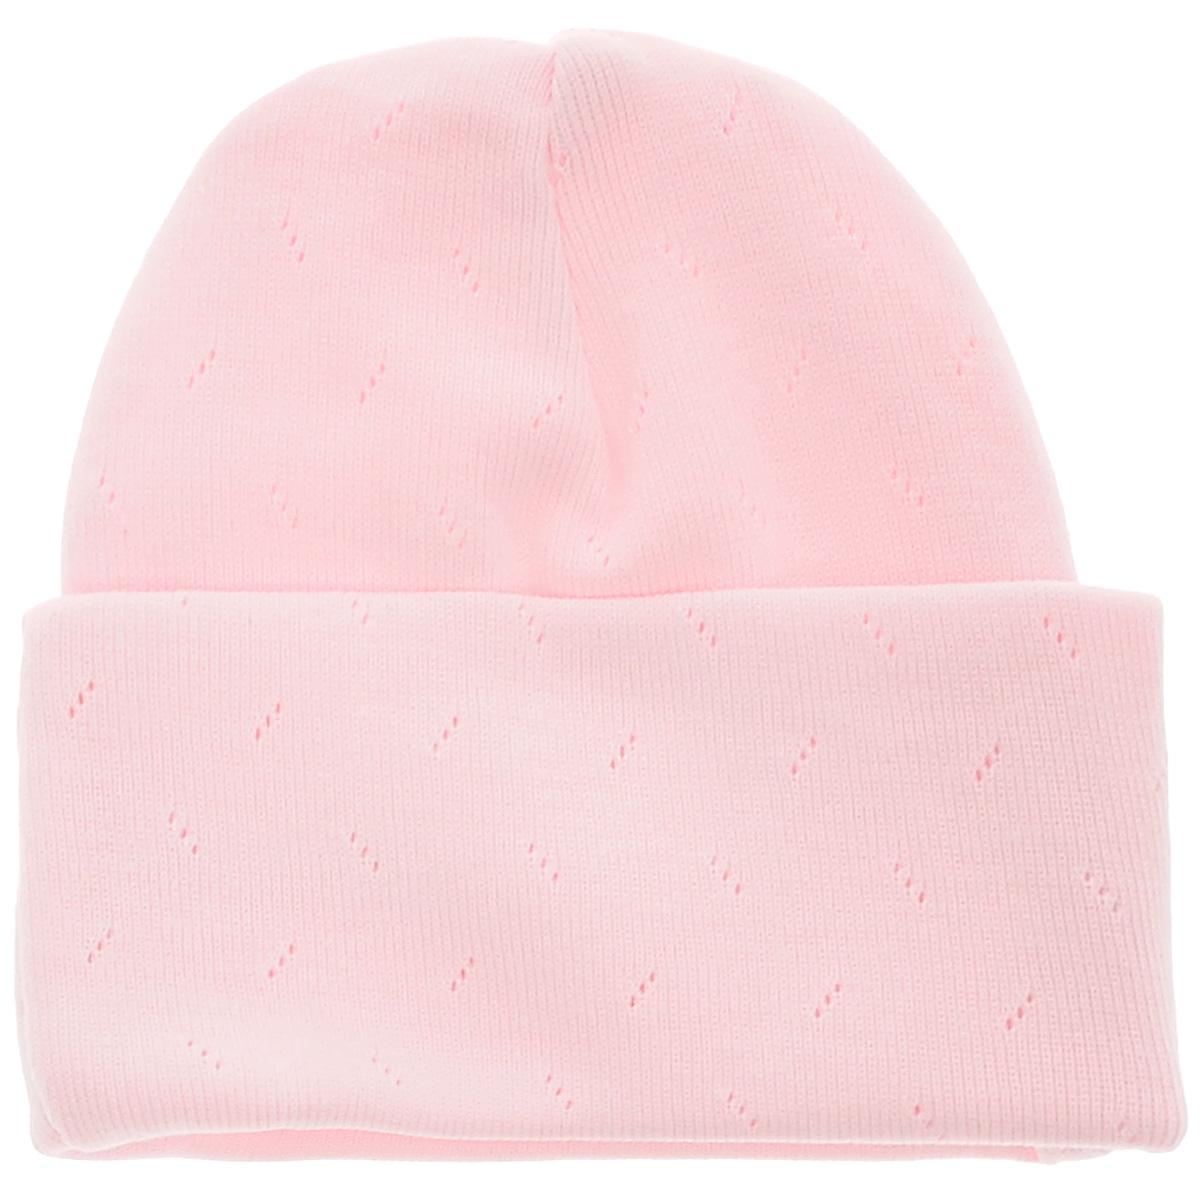 Шапочка унисекс Lucky Child Ажур, цвет: светло-розовый. 0-9. Размер 38